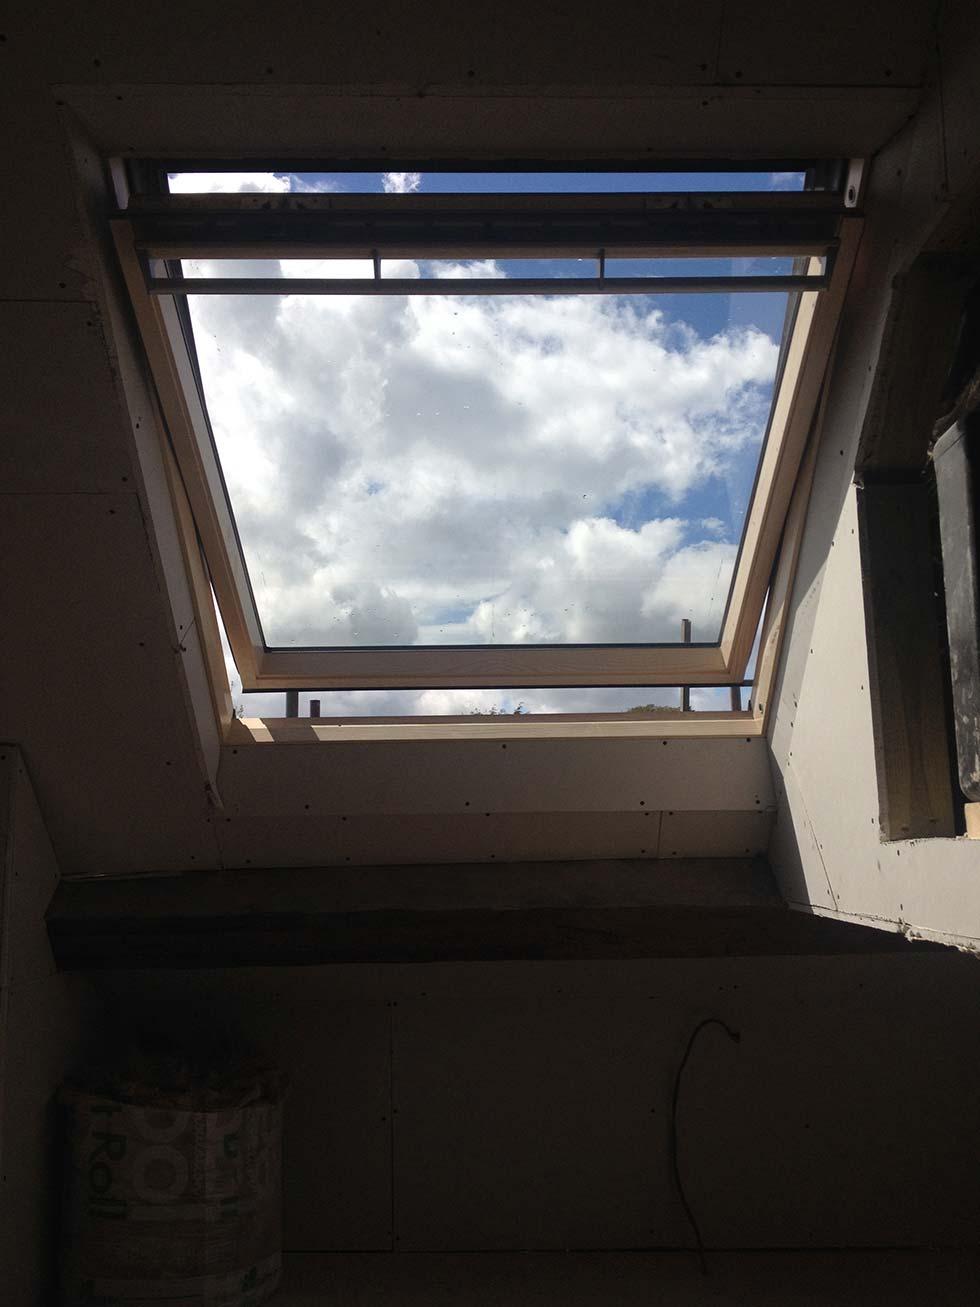 Large velum rooflight in loft conversion